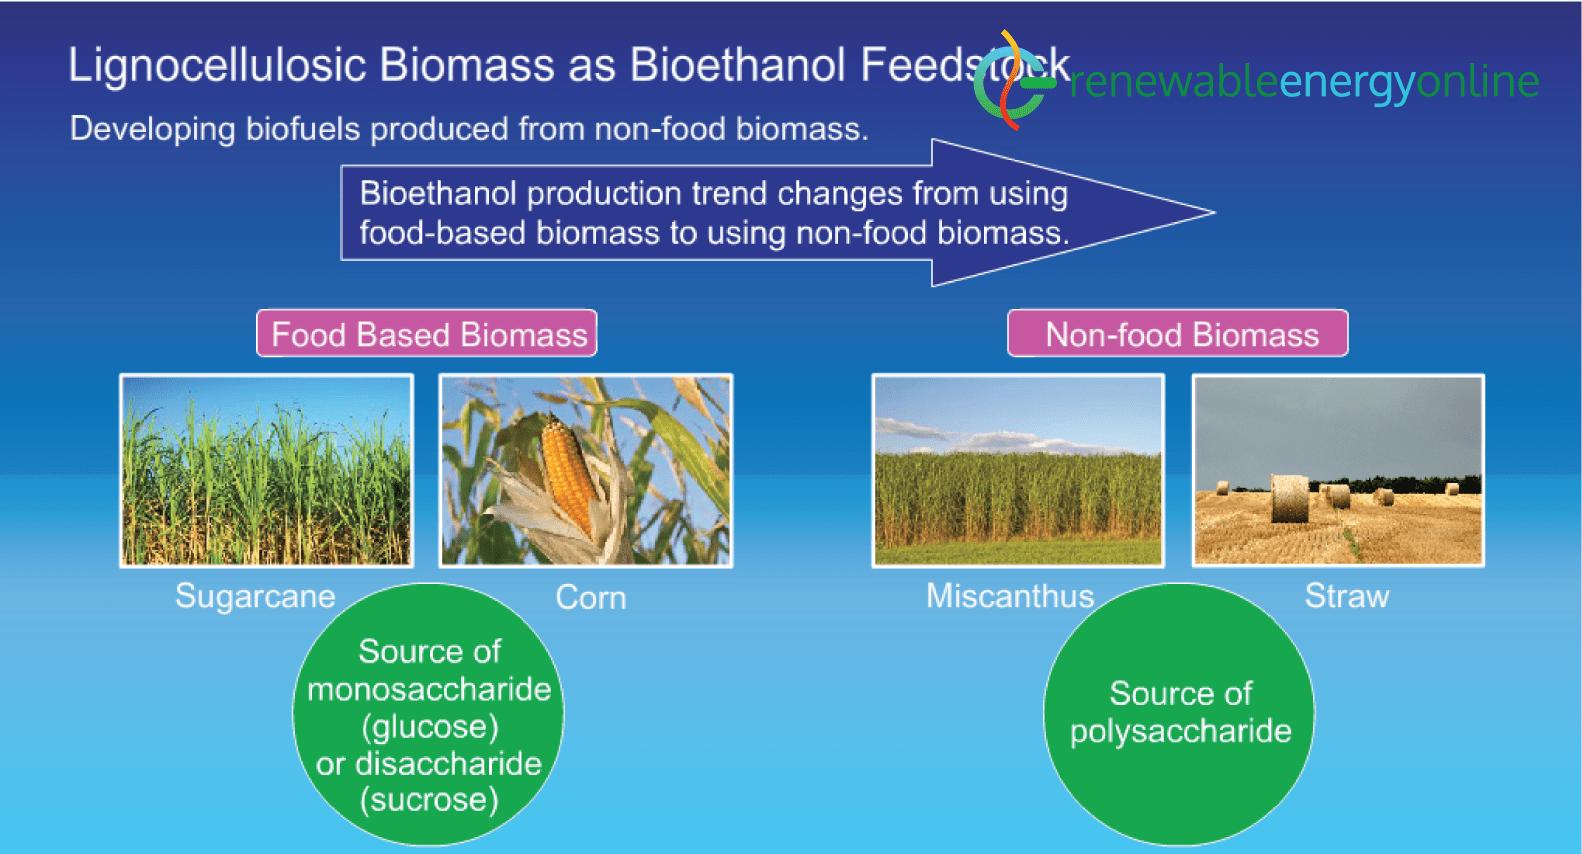 Lignocellulosic biomass